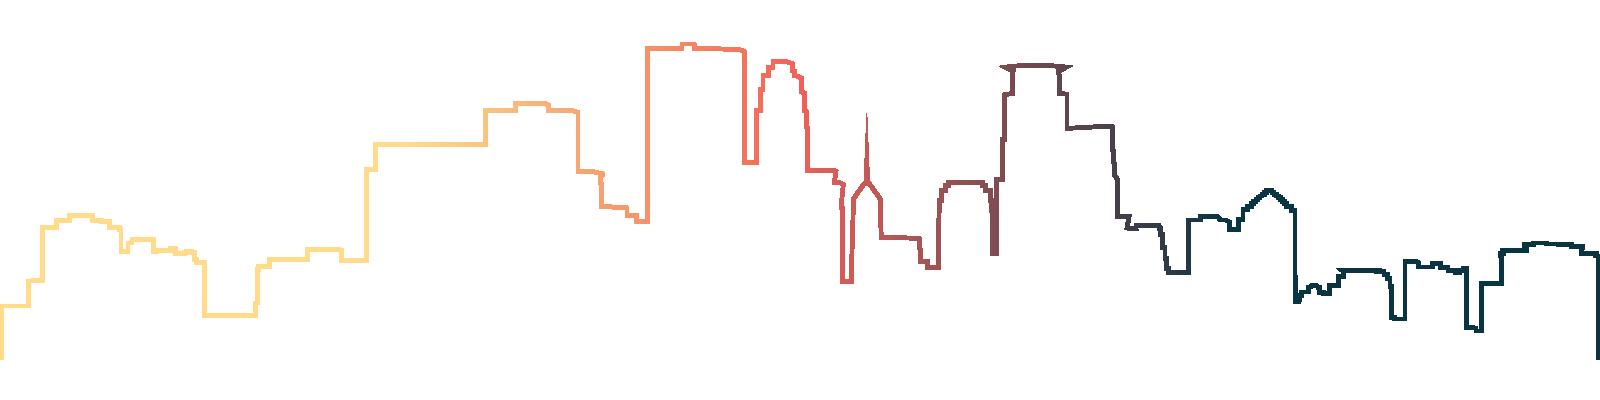 fleming-mpls-skyline